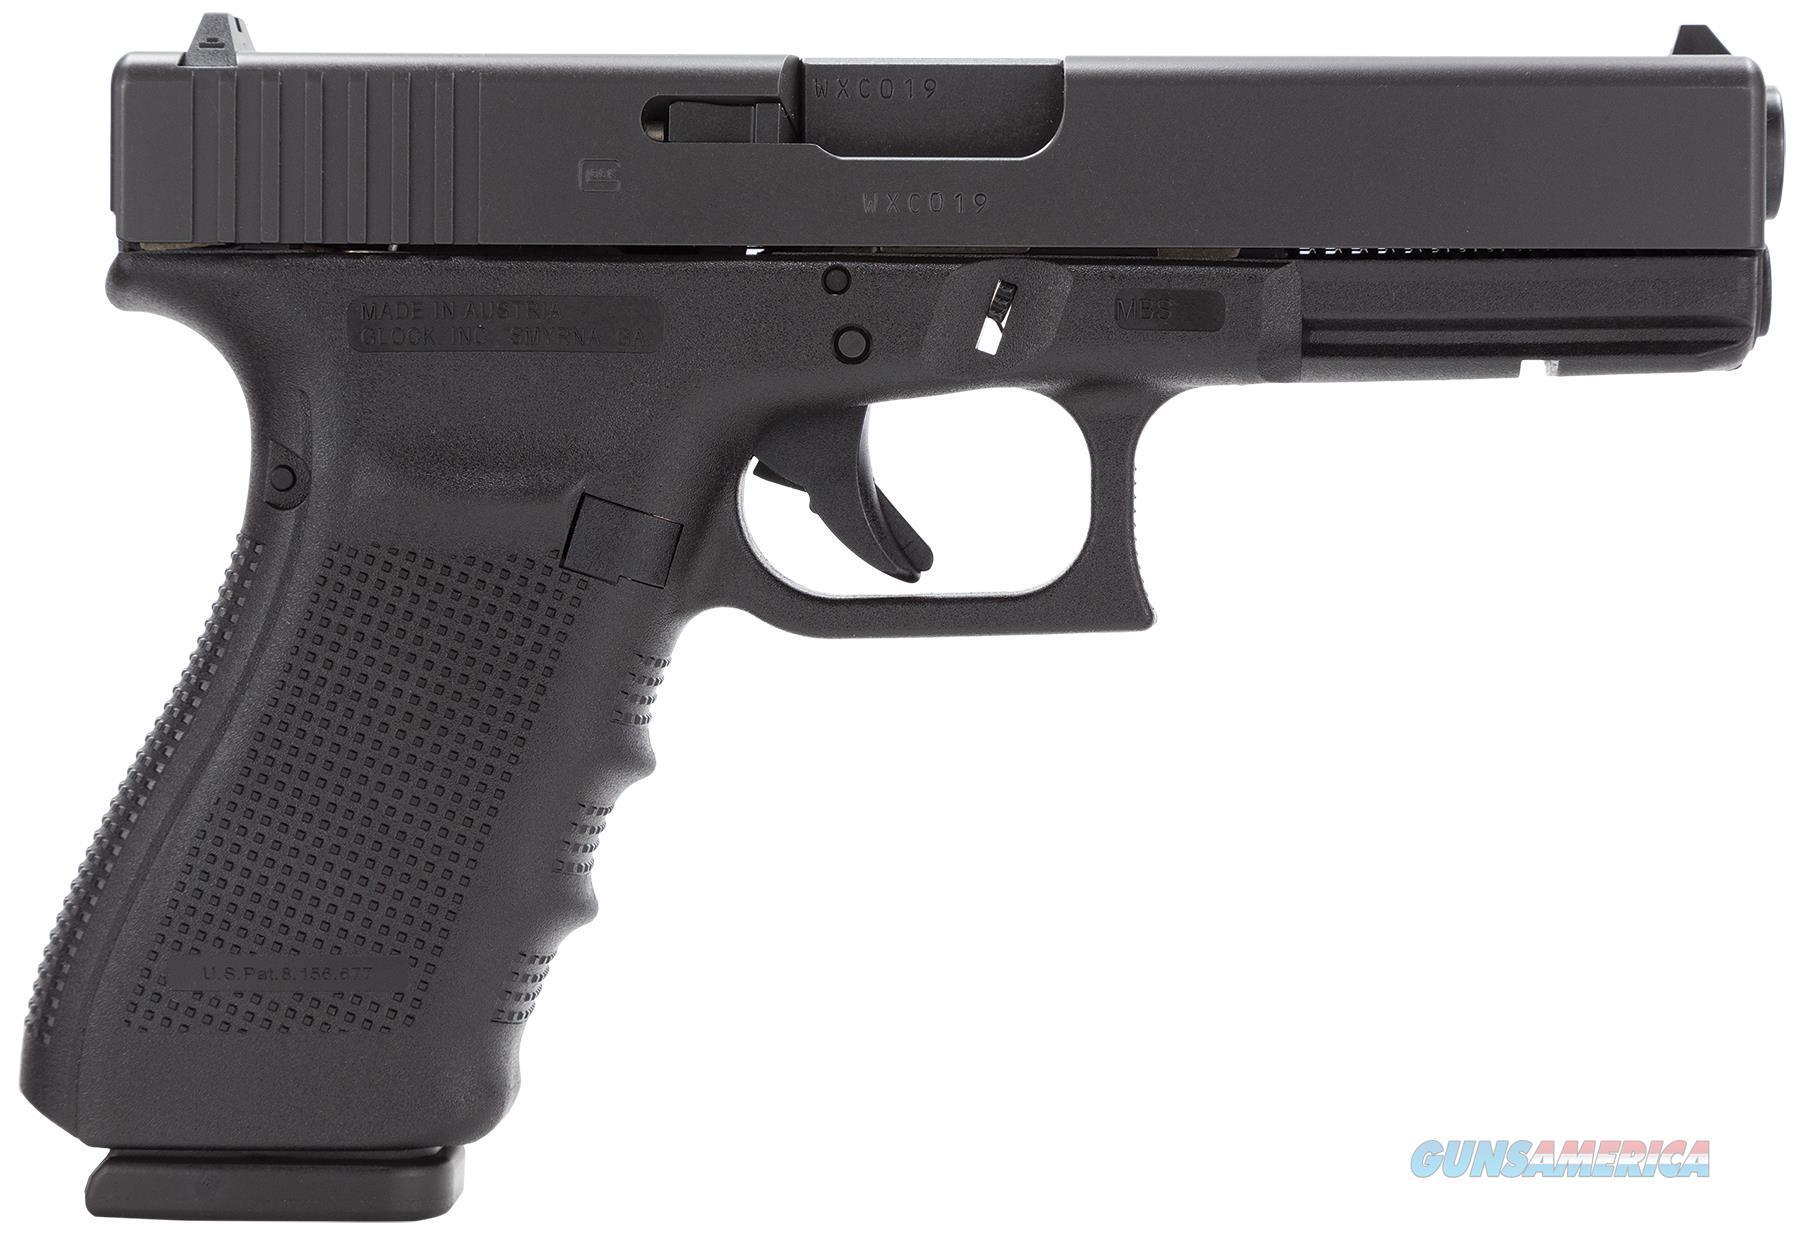 Glock G21 Gen4 Semi Auto Pistol 45 Acp, 4.6 In, Poly Grp, 13+1 Rnd, Fixed, Full Sz Blk Frame PG2150203  Guns > Pistols > G Misc Pistols